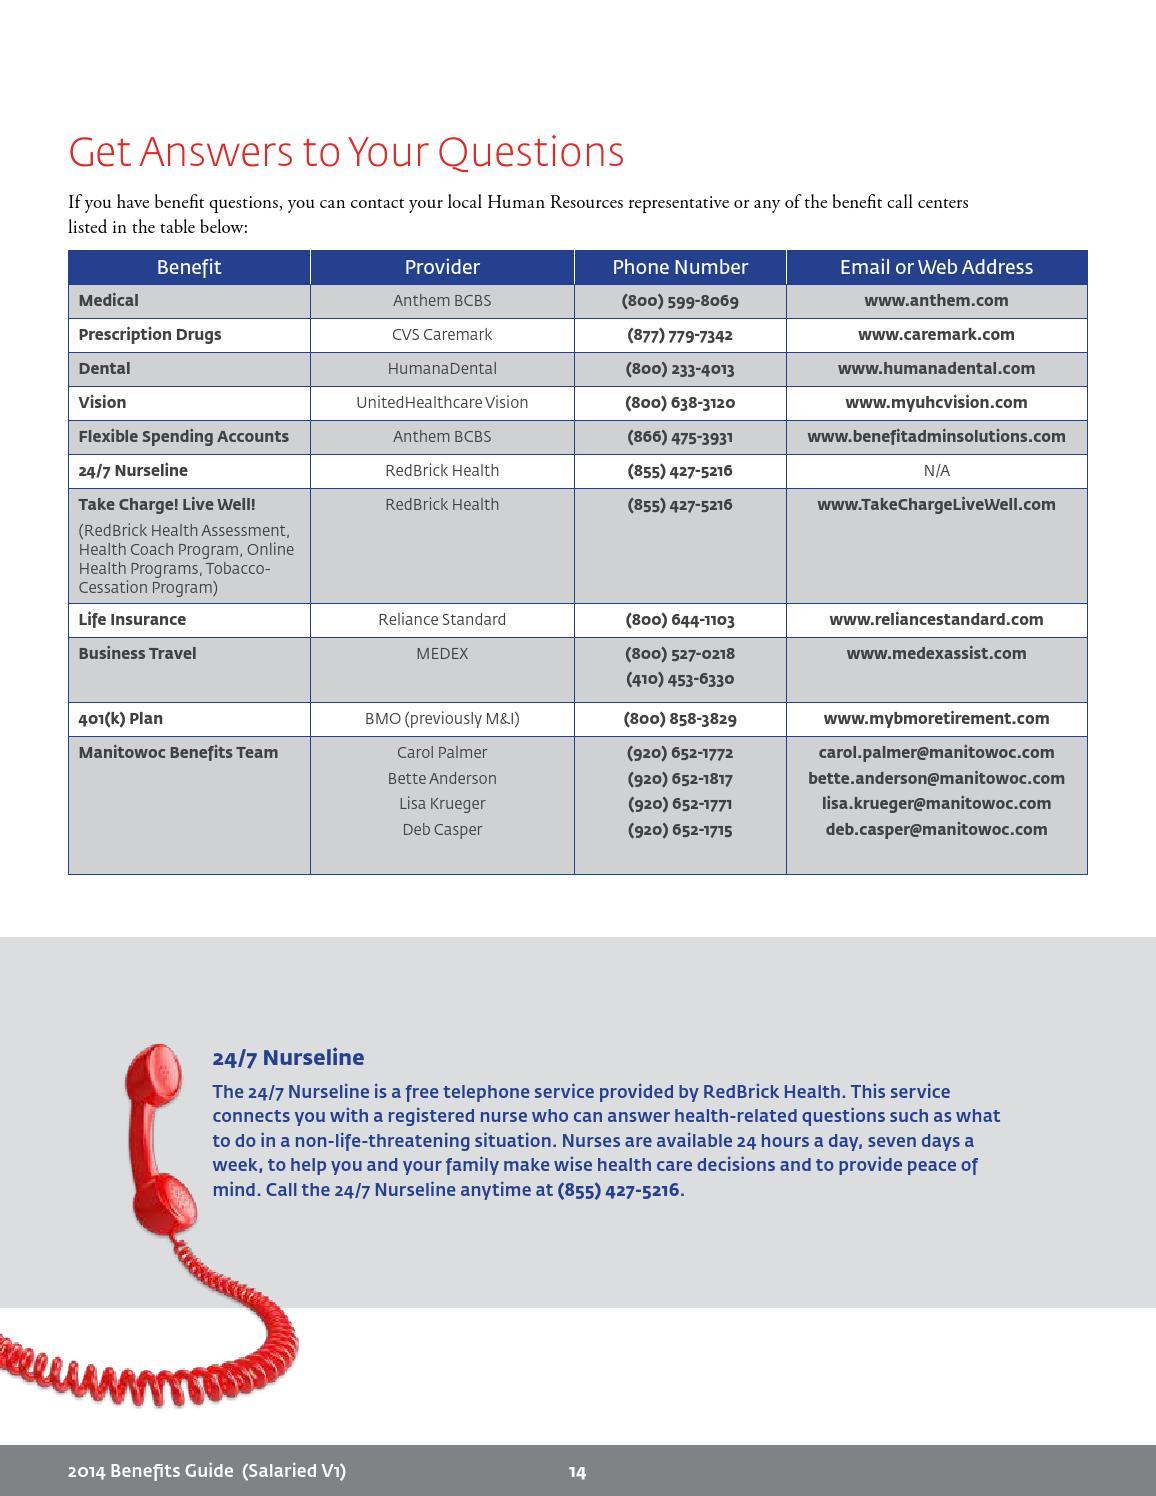 Manitowoc Corporate Benefits Manual by Julie Gerovski ...